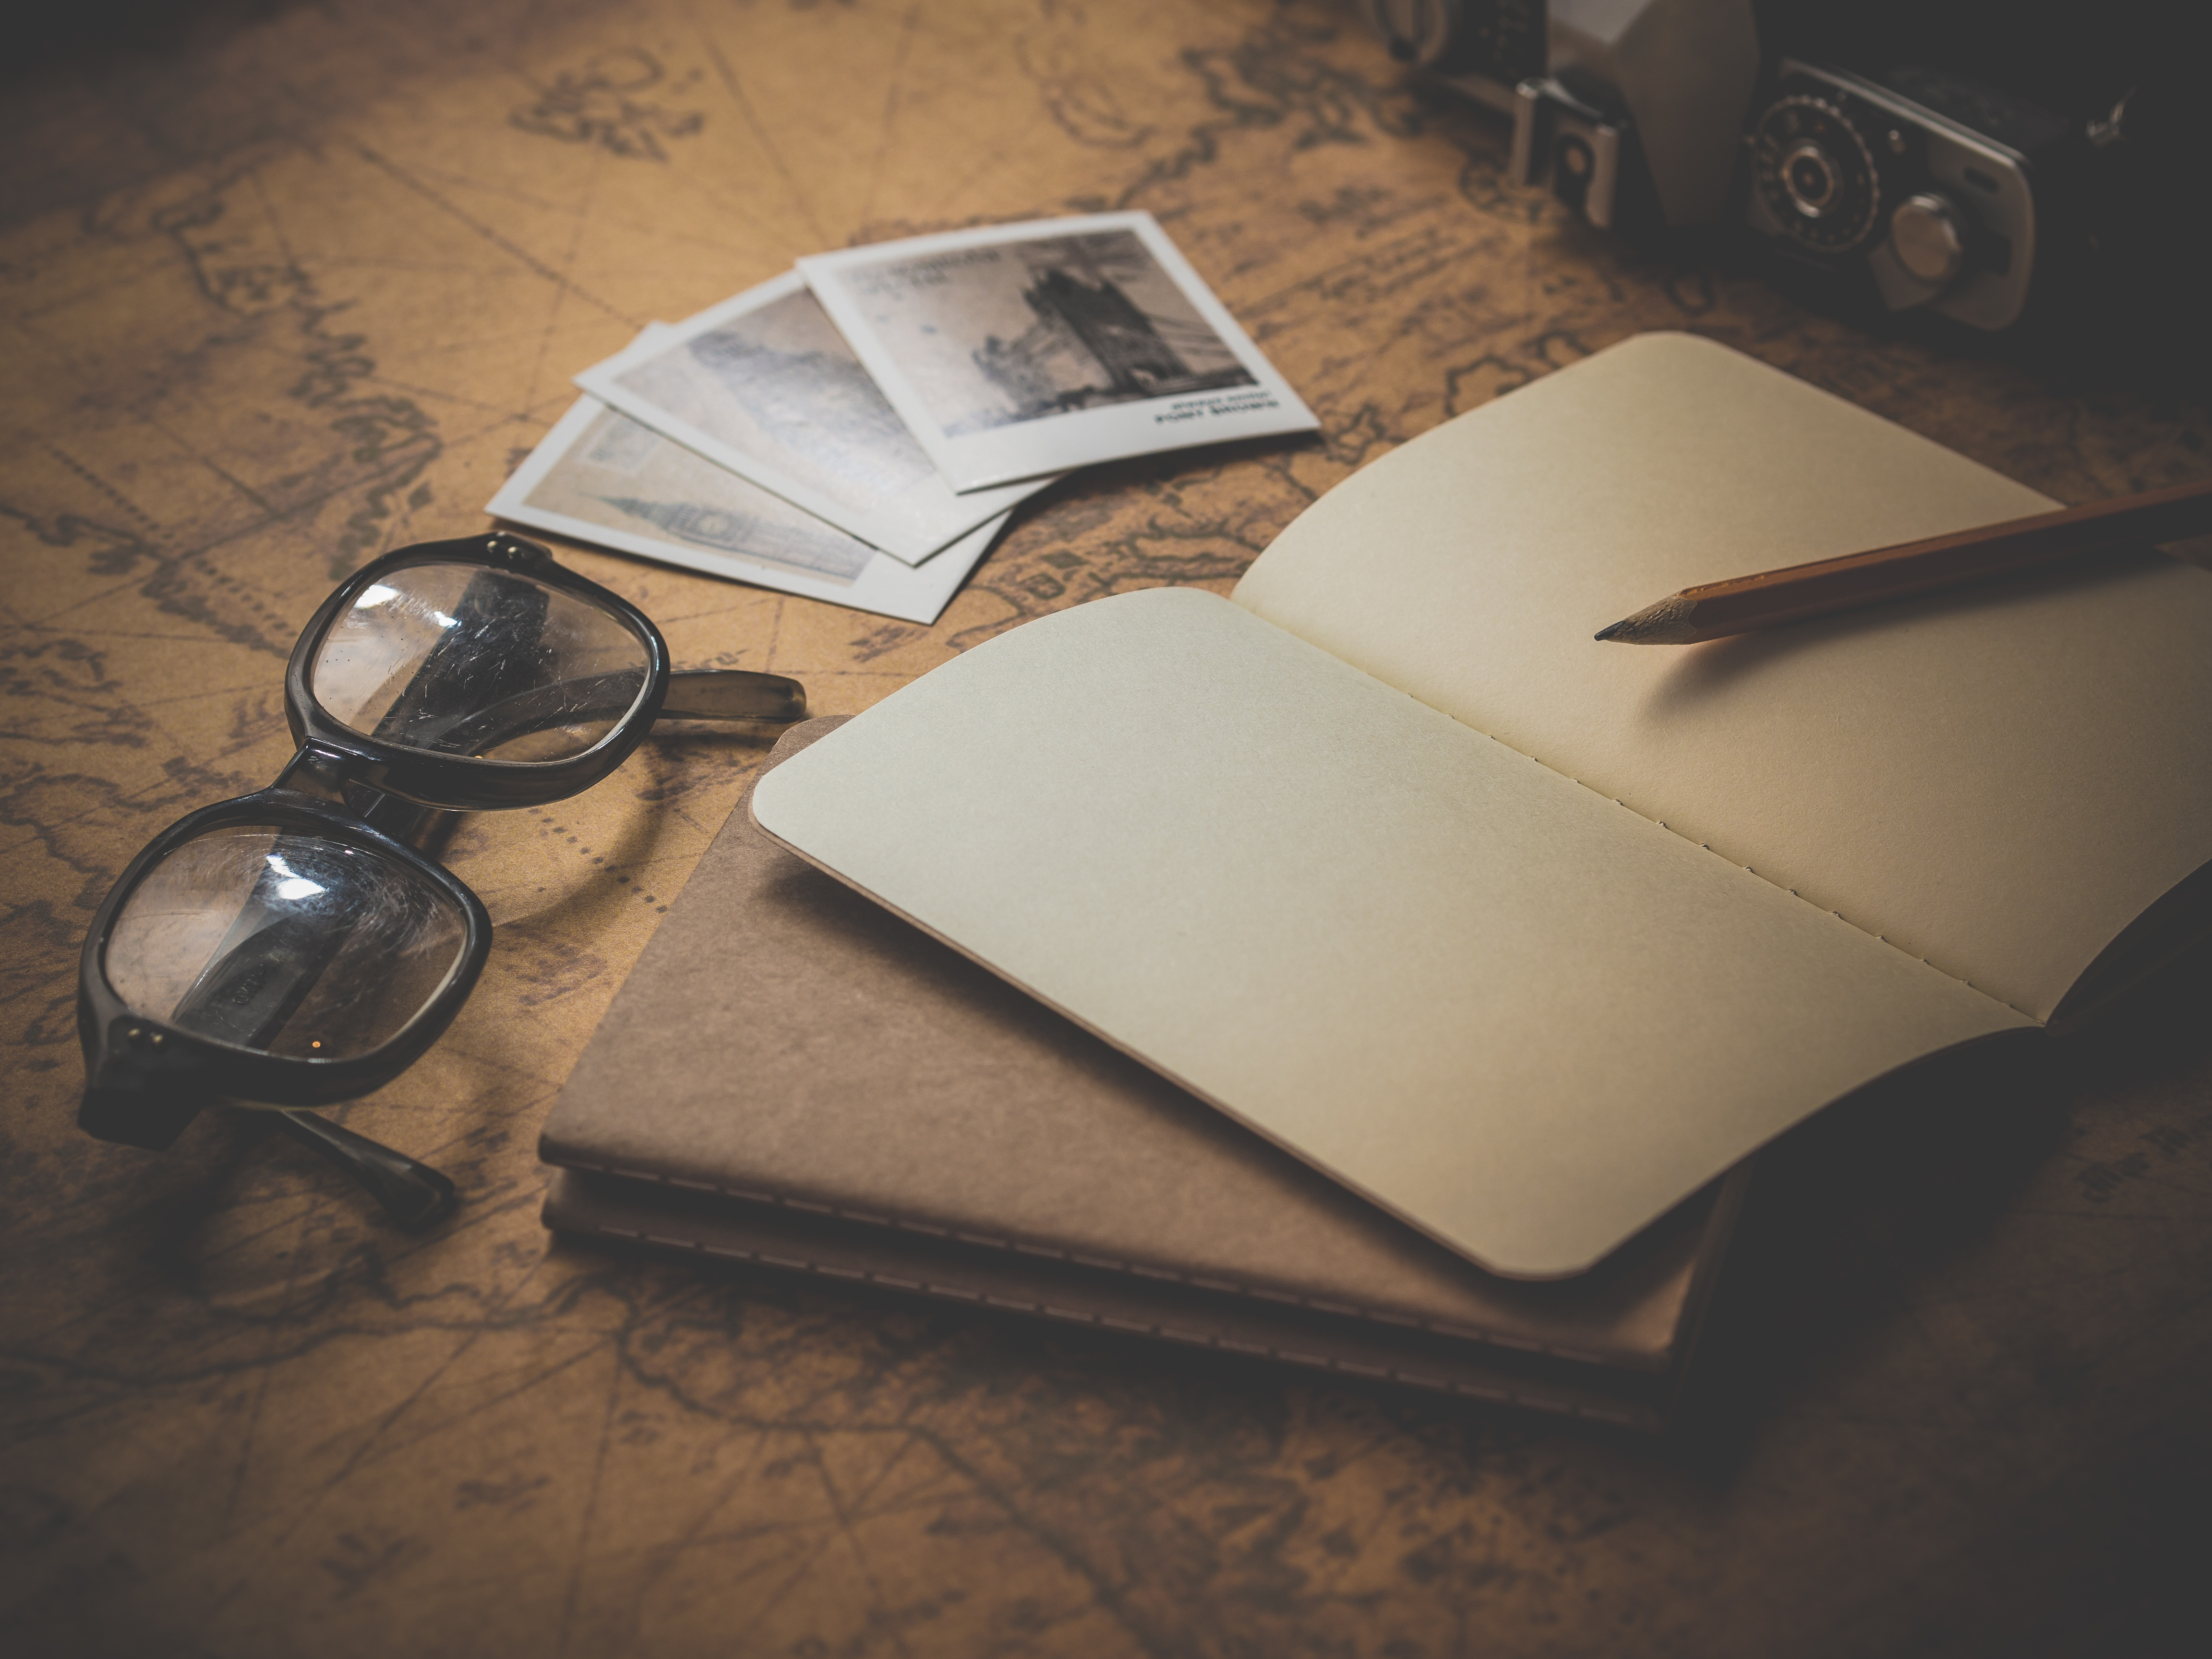 Blank travel journal, travel, ancient, notepad, map, sunglasses, travel, plan